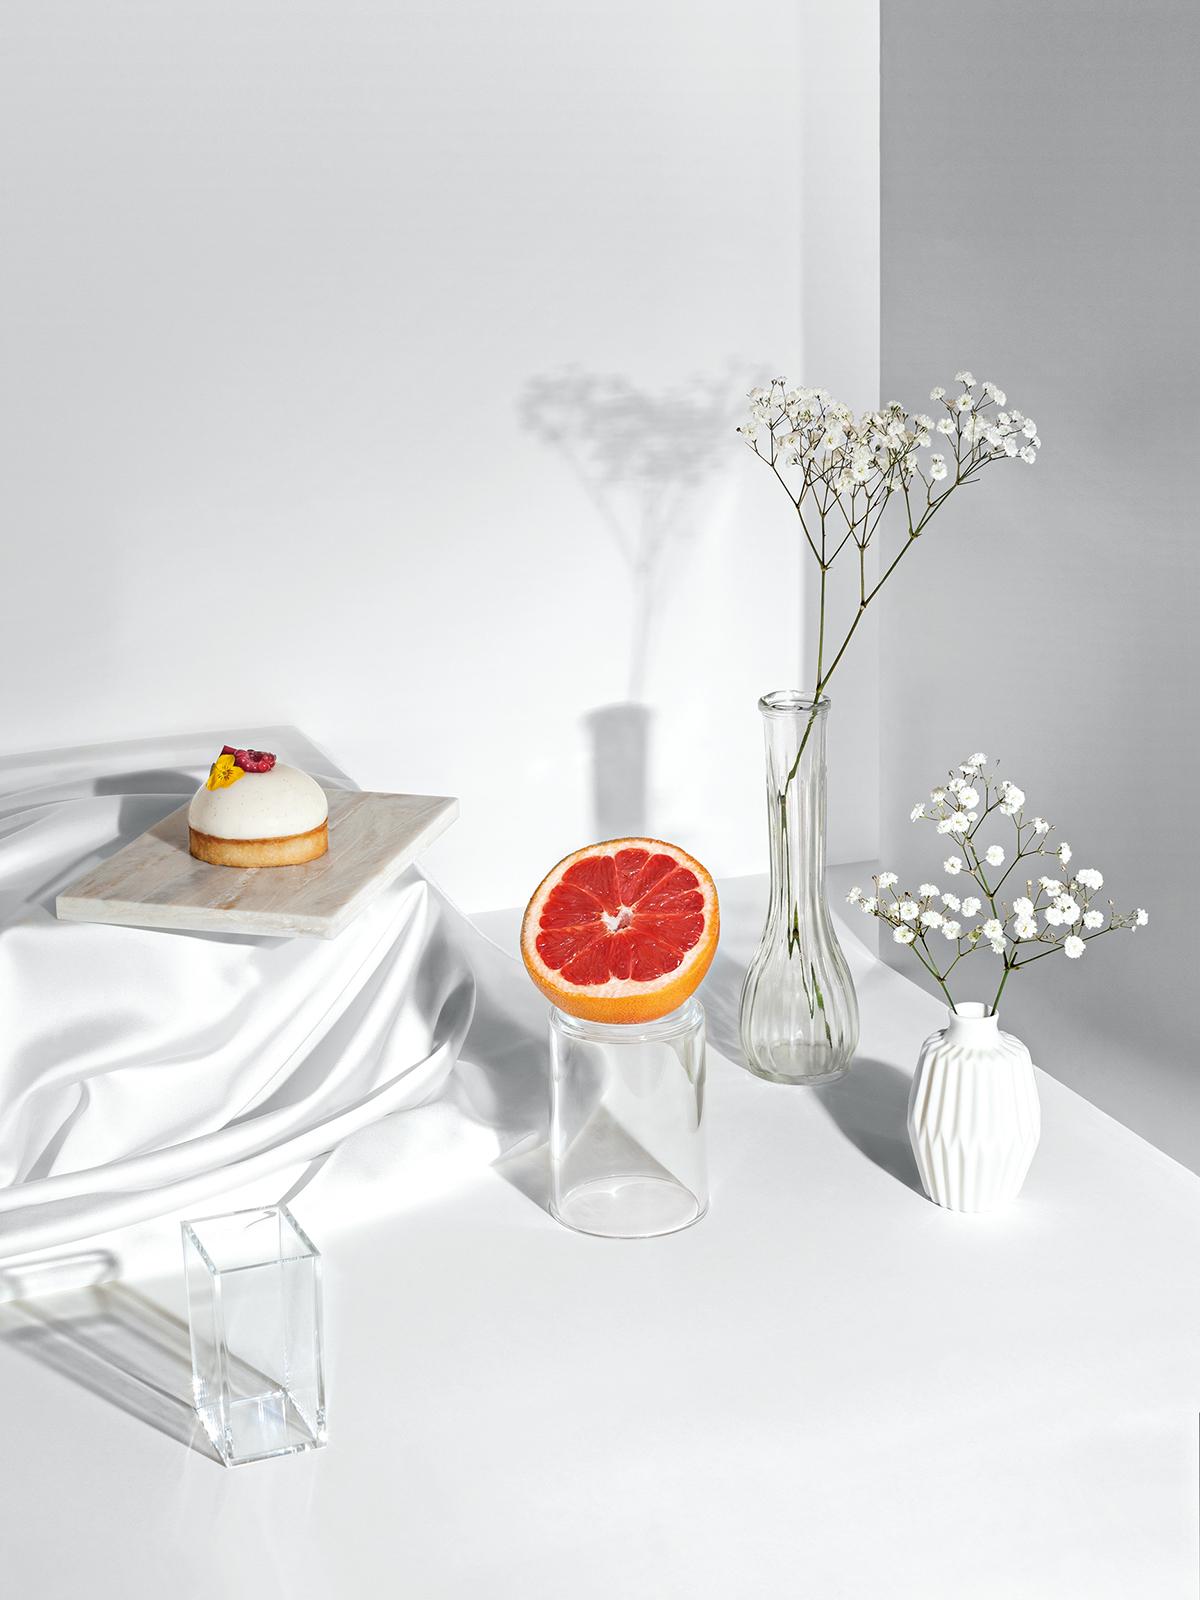 pastry Patisserie set design  french patisserie still life cake vanité sweet memories set design photography